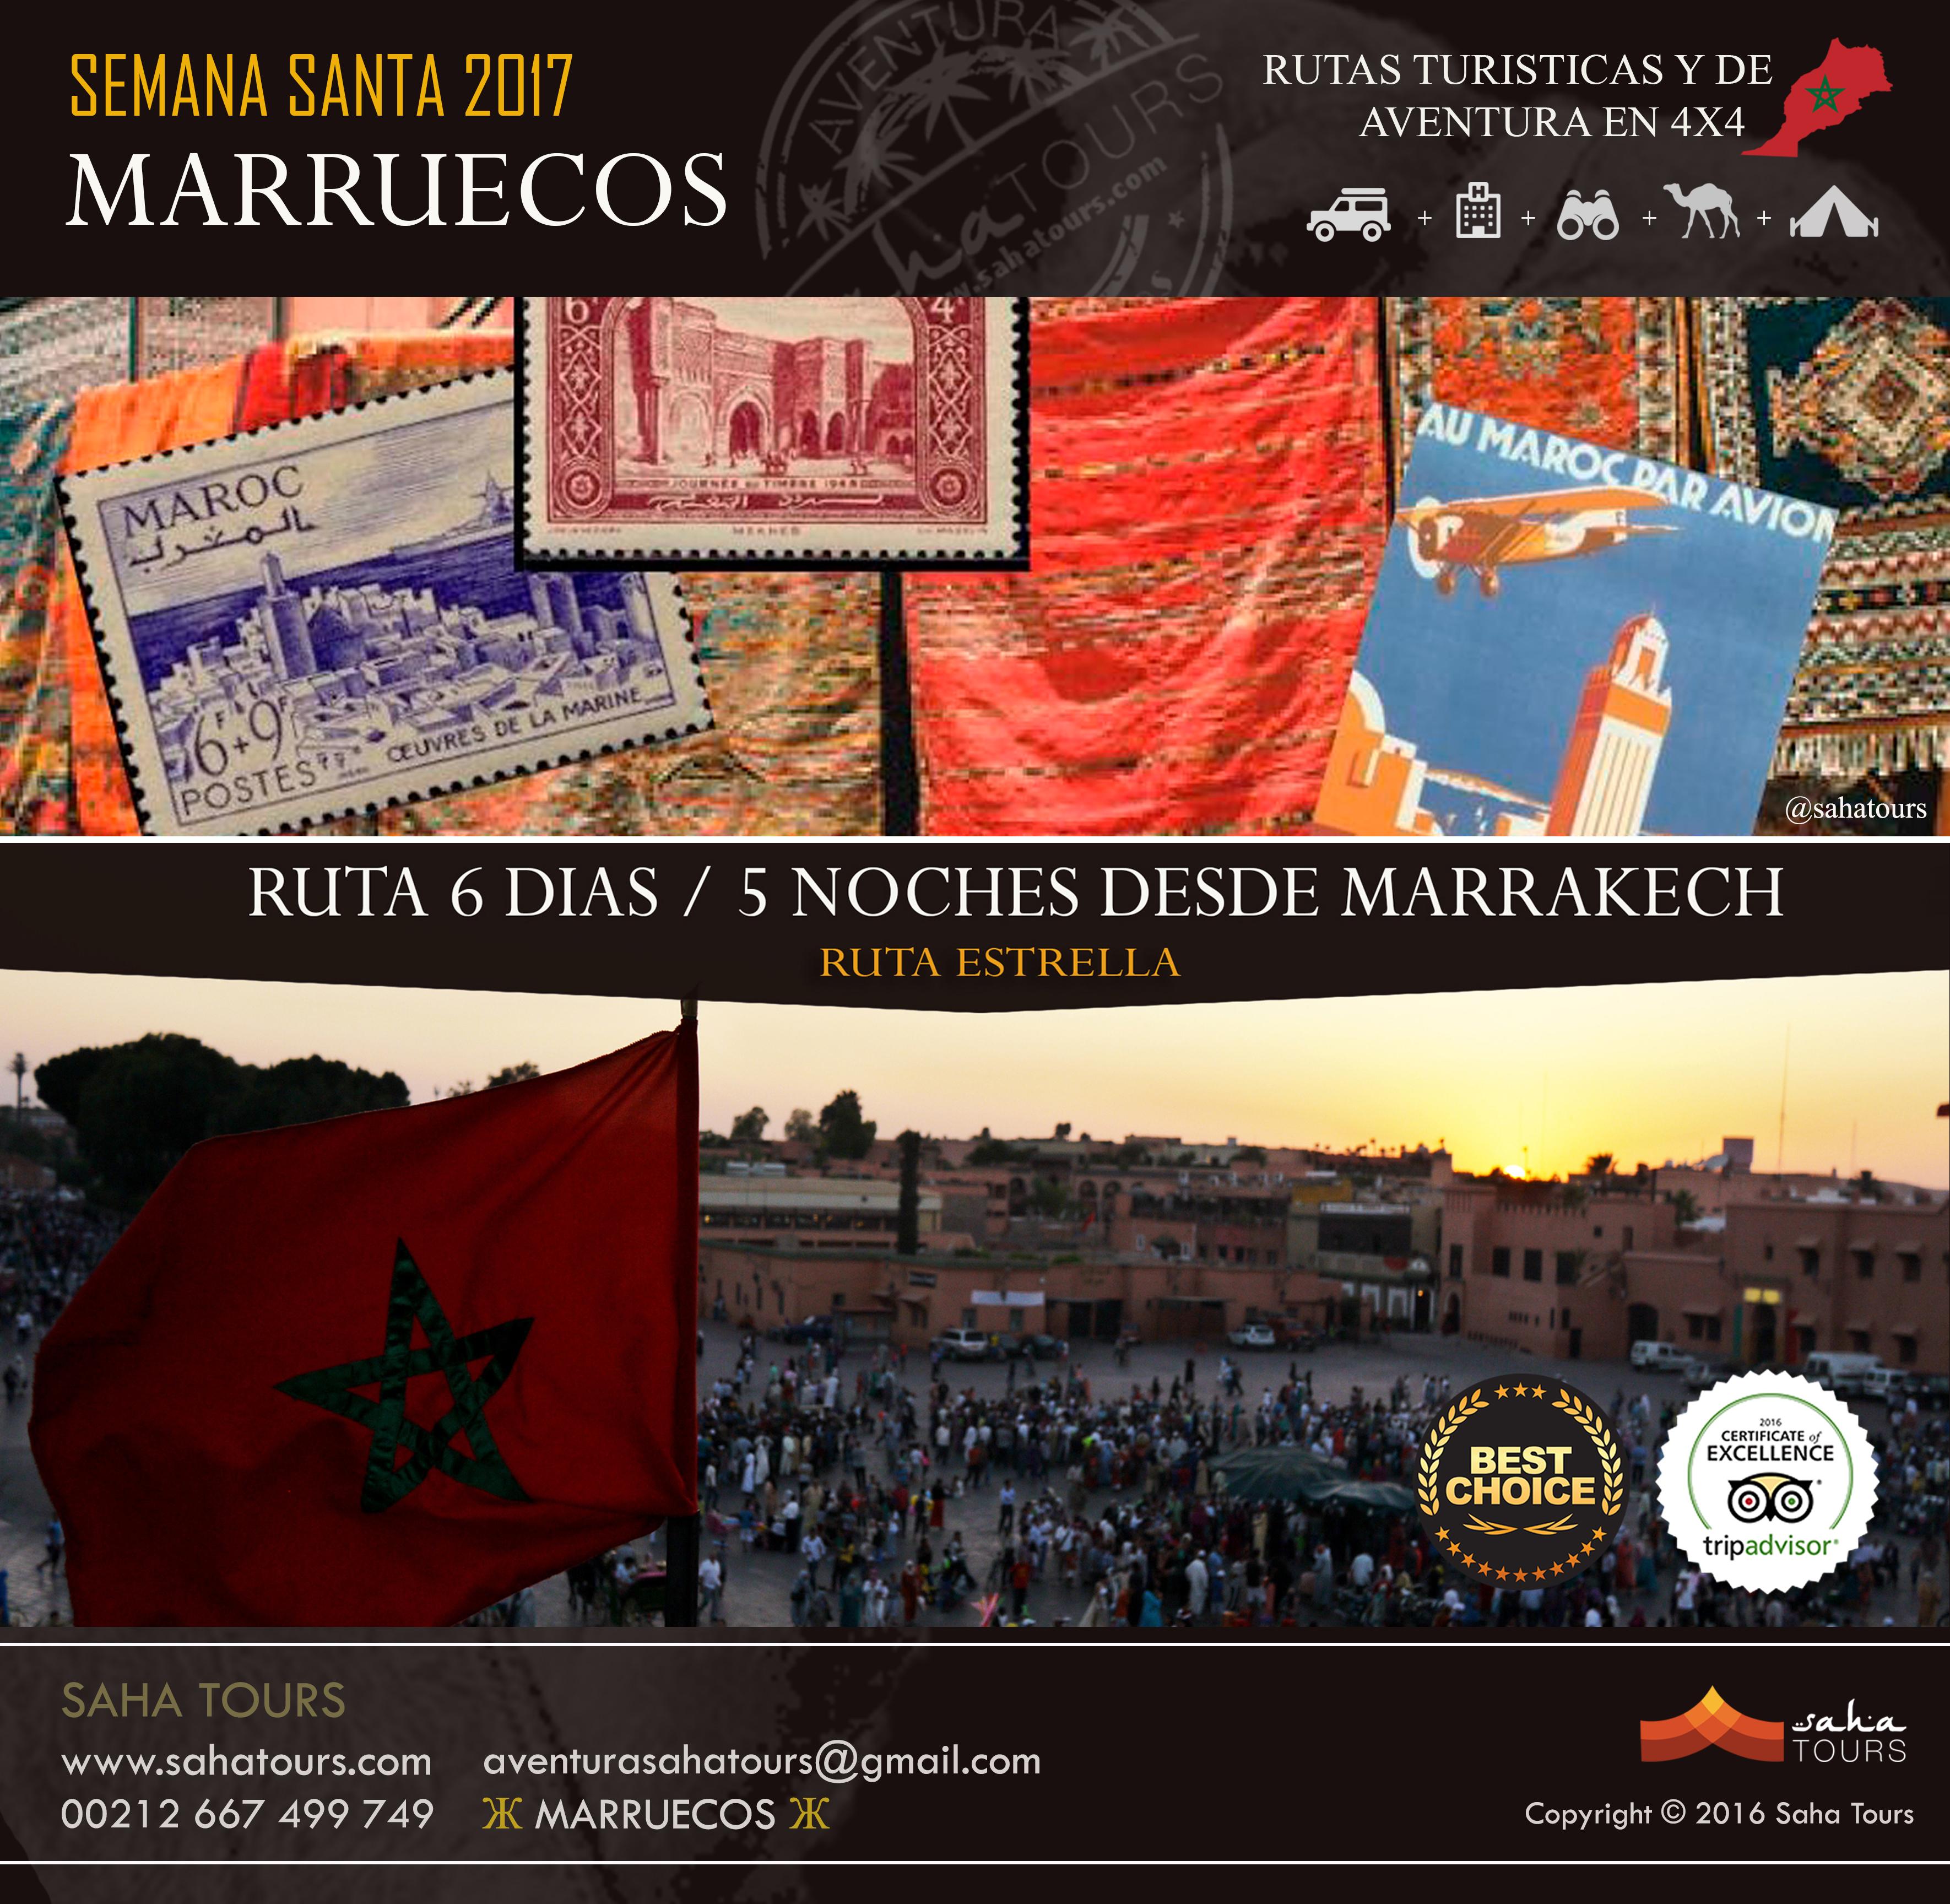 VIAJE A MARRUECOS - SEMANA SANTA 2017 - RUTA 6 DIAS / 5 NOCHES DESDE MARRAKECH 1